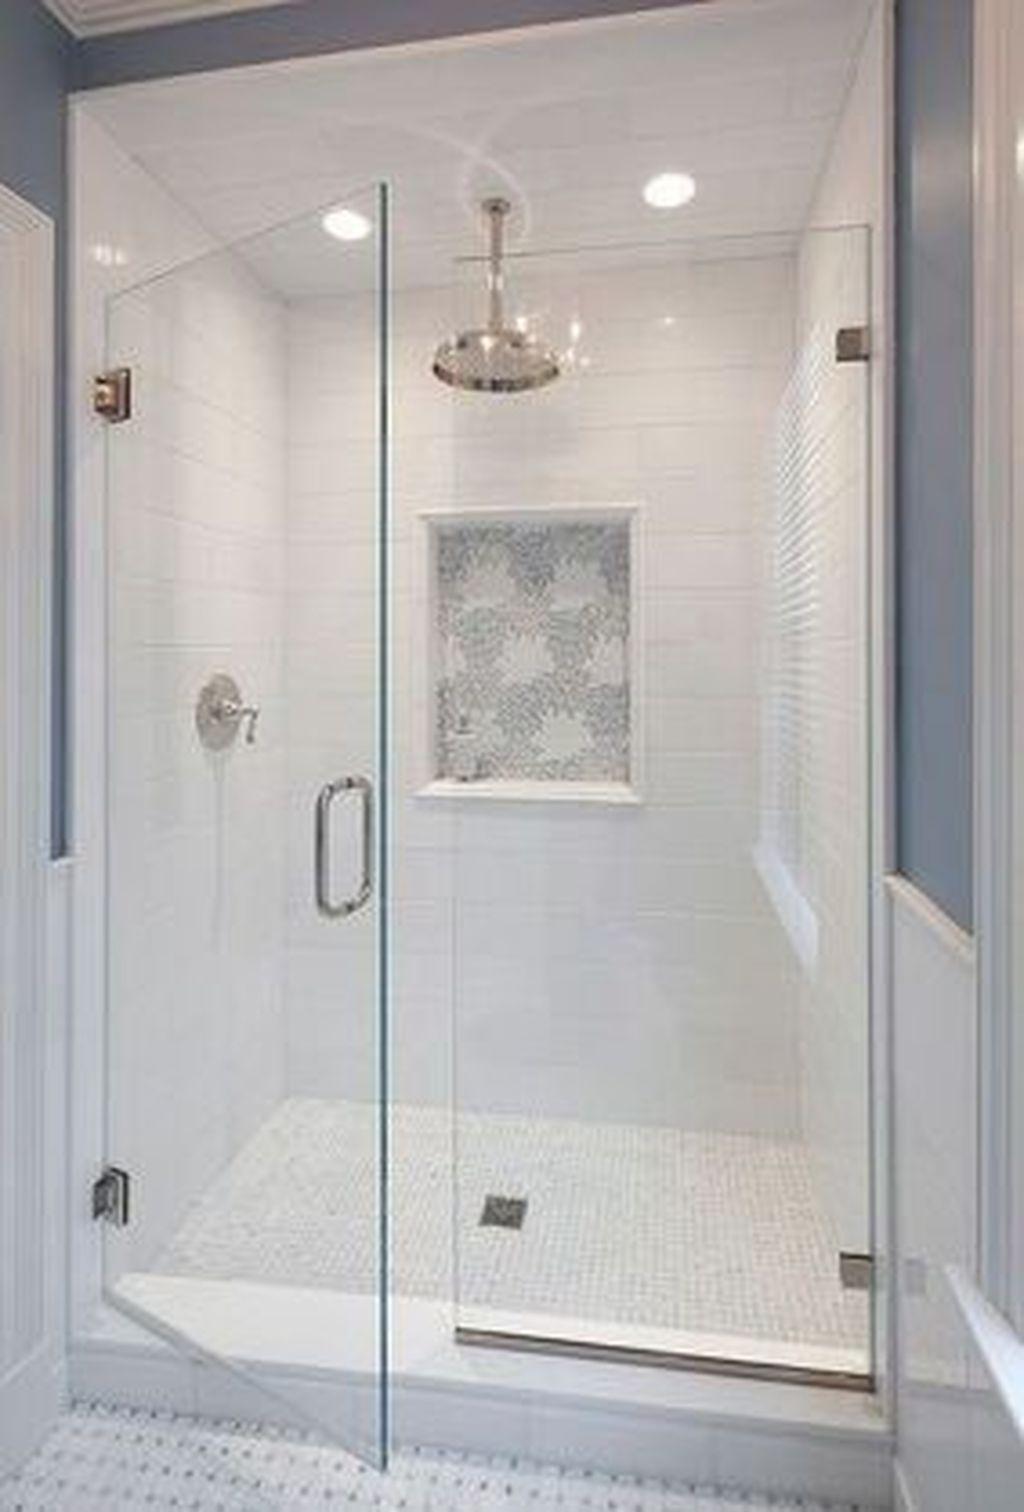 Lovely Bathroom Ceramic Tile Ideas You Should Copy 15